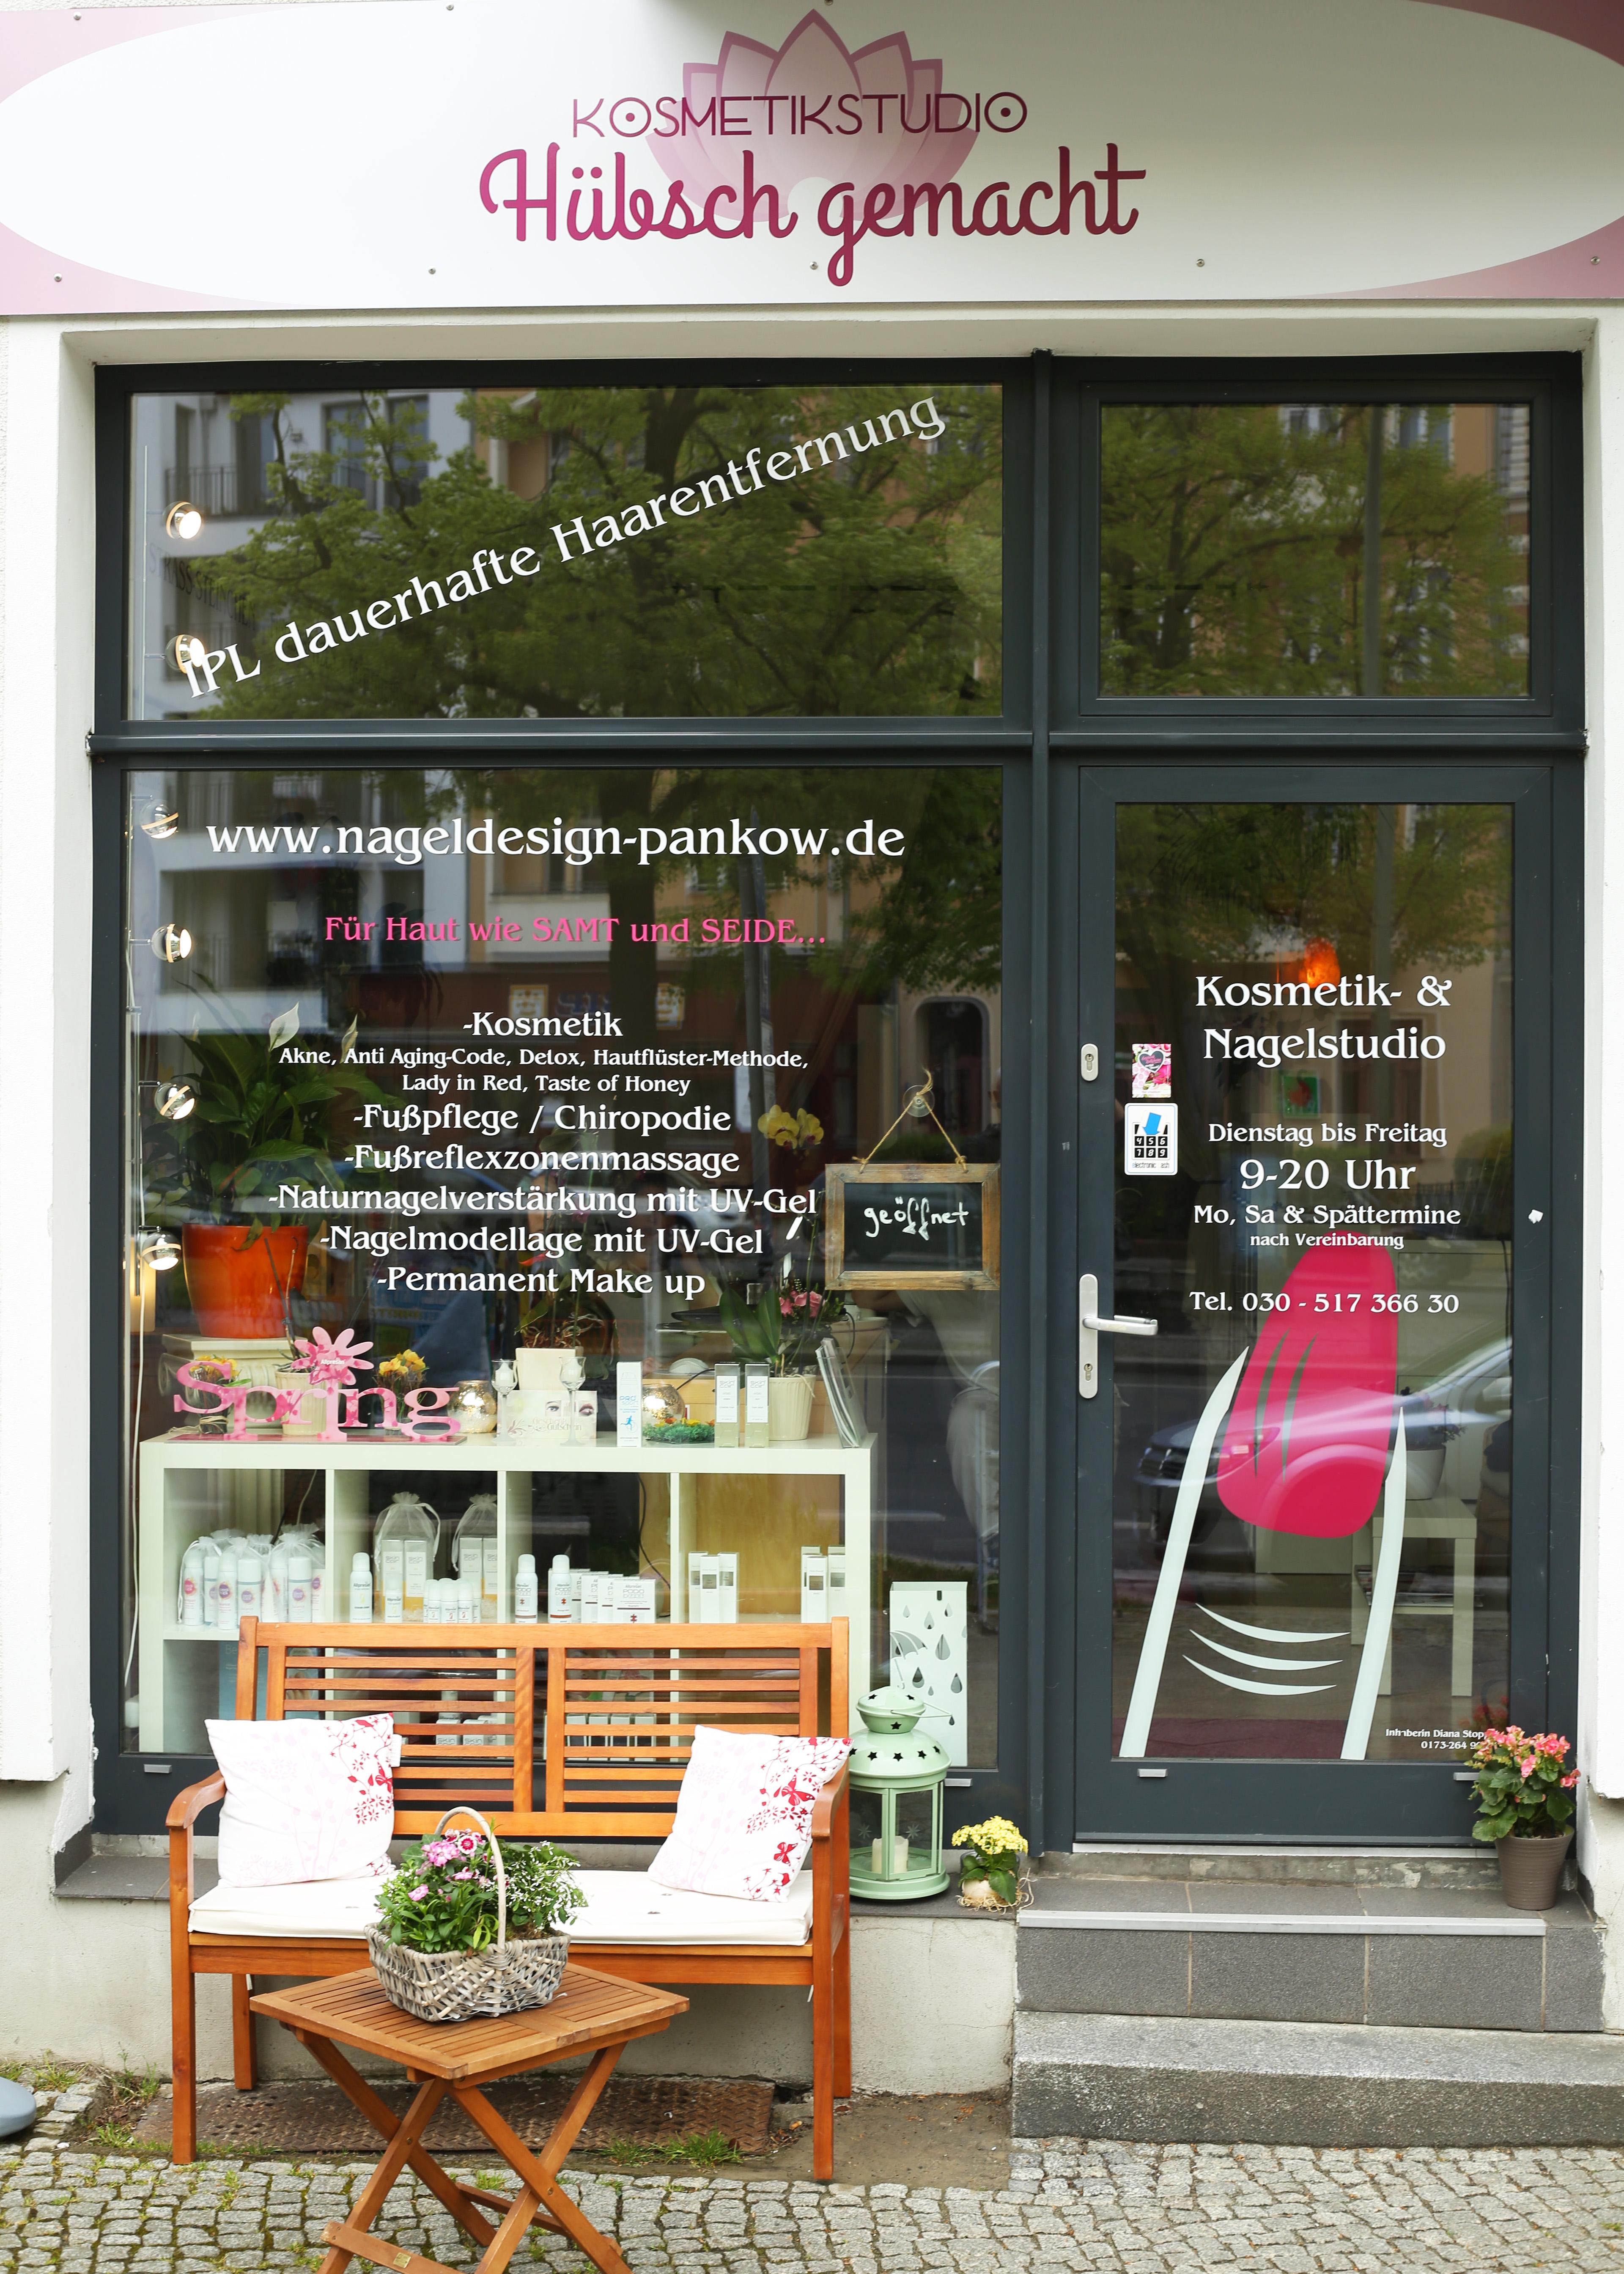 Unser Studio – Kosmetikstudio in Pankow – Nageldesign Berlin